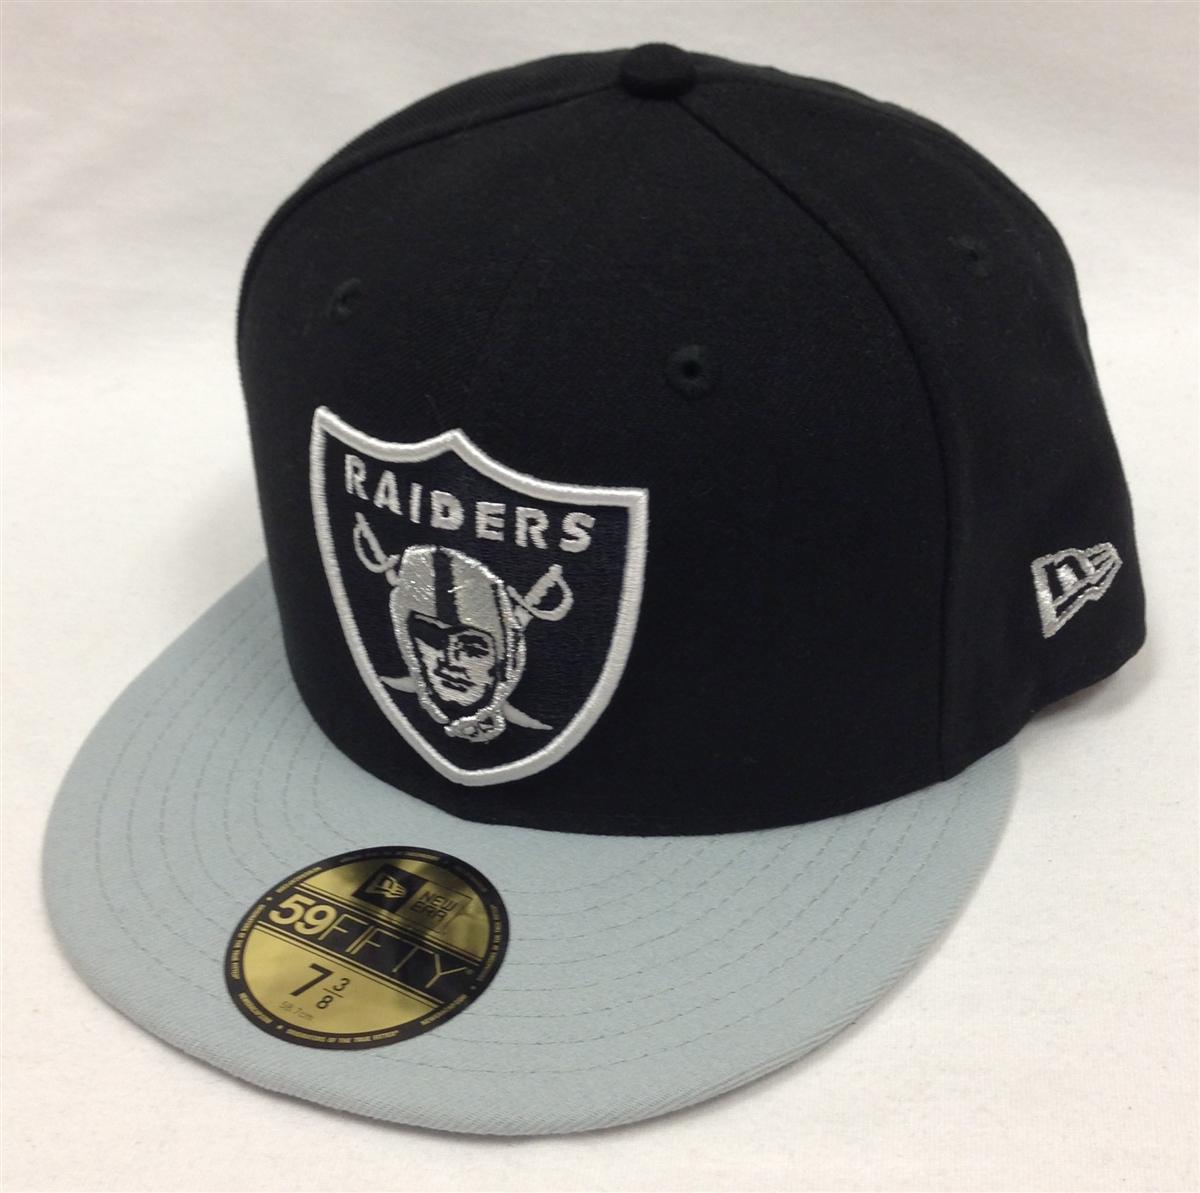 New Era 59Fifty Black Team Oakland Raiders Black   Gray Fitted Cap 6ced37e0988